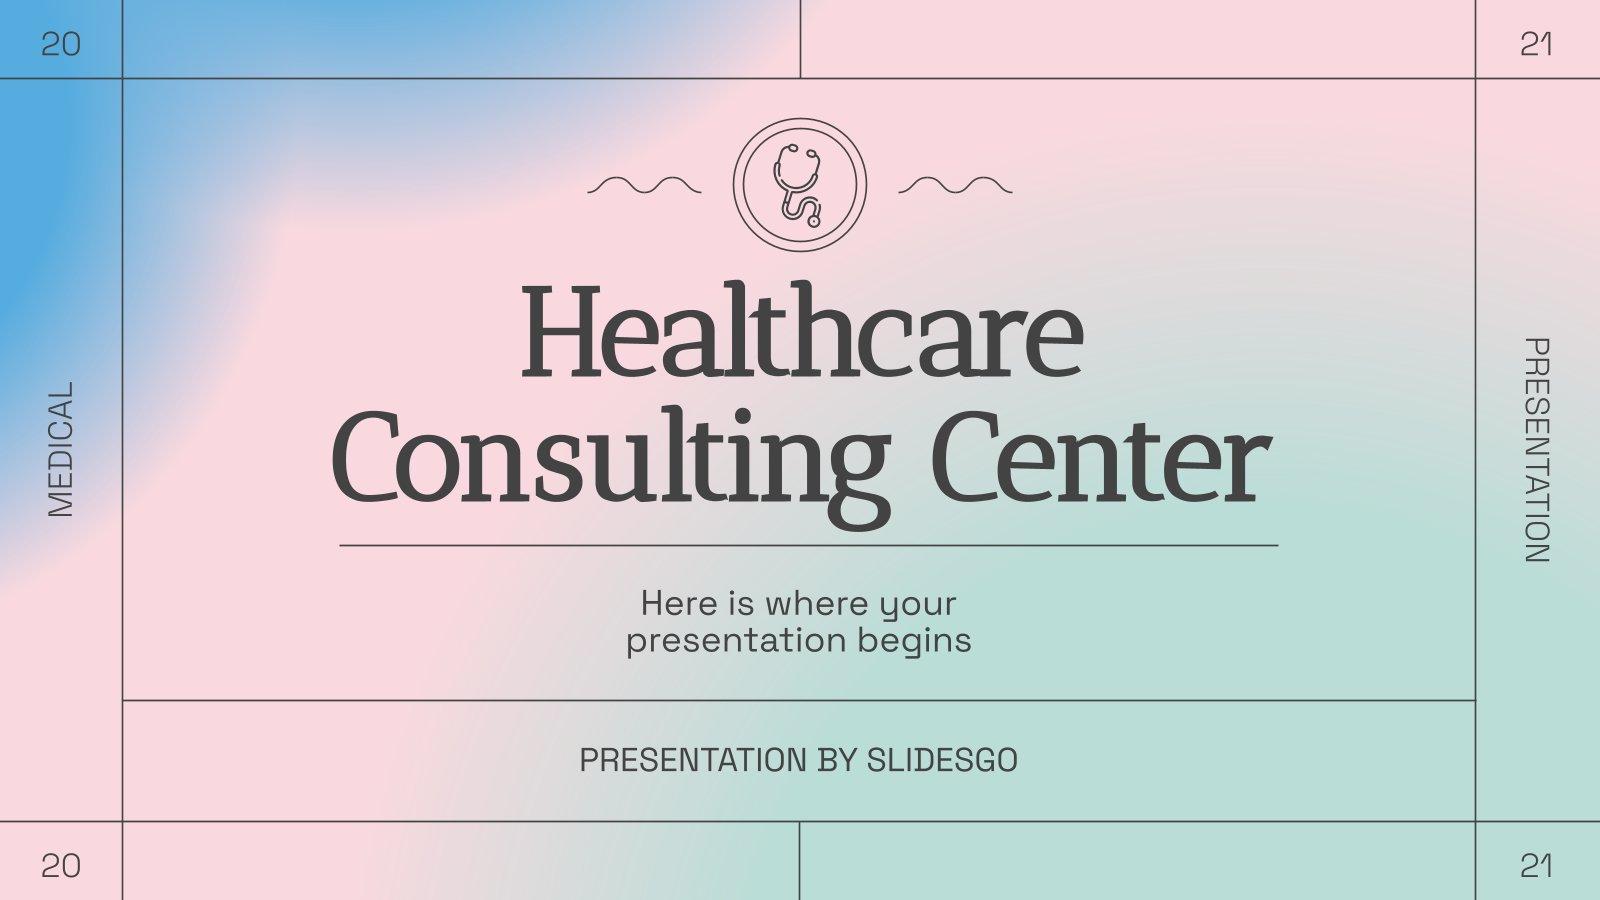 Healthcare Consulting Center presentation template